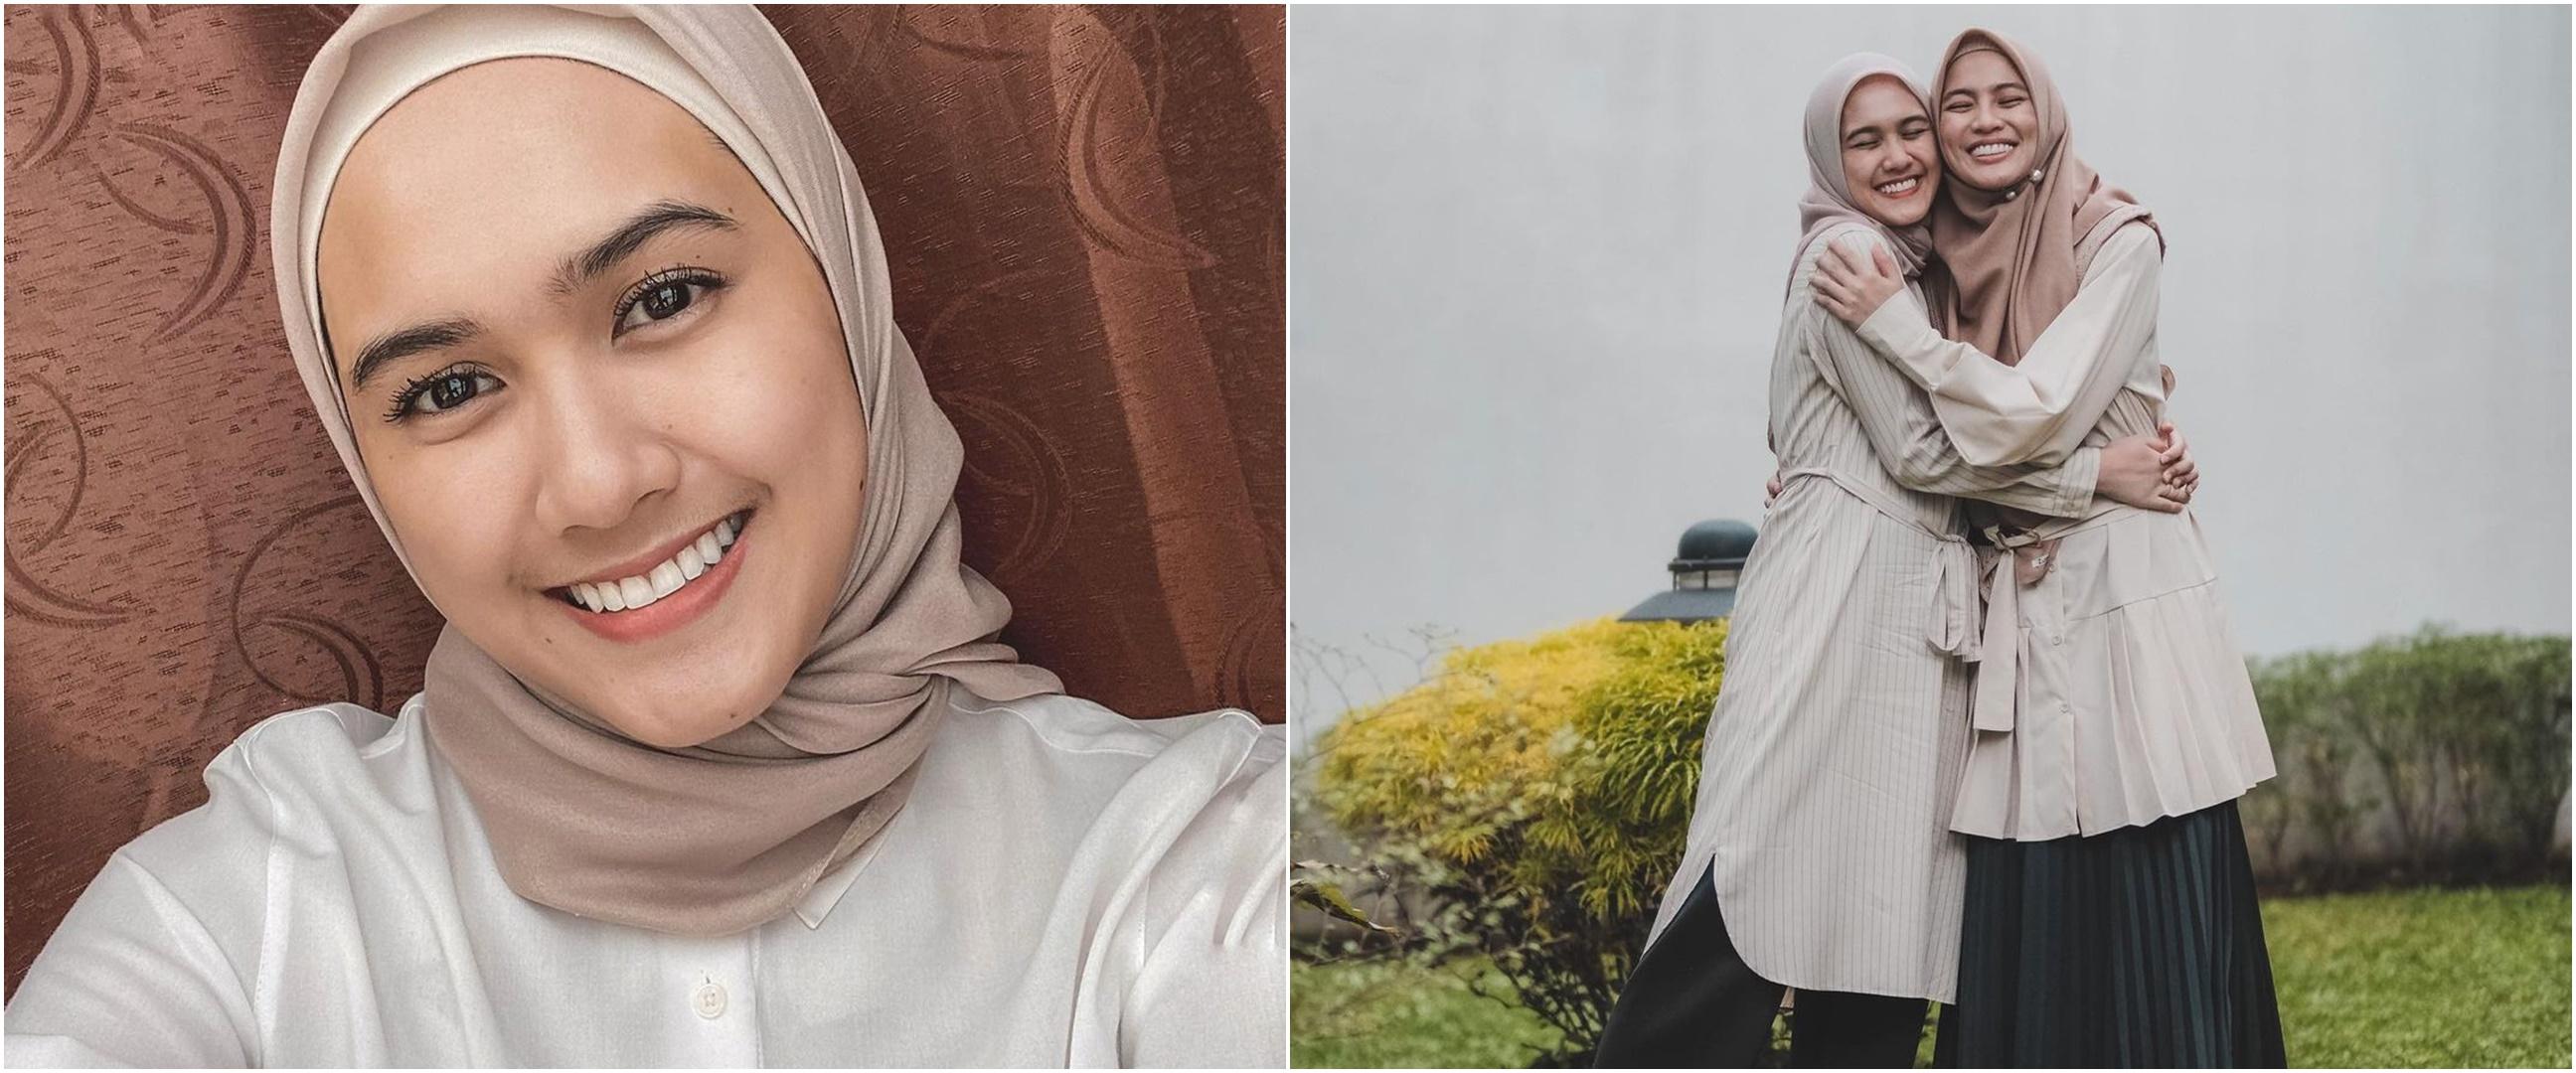 7 Potret terbaru Annissa adik Alyssa Soebandono, kini tampil berhijab